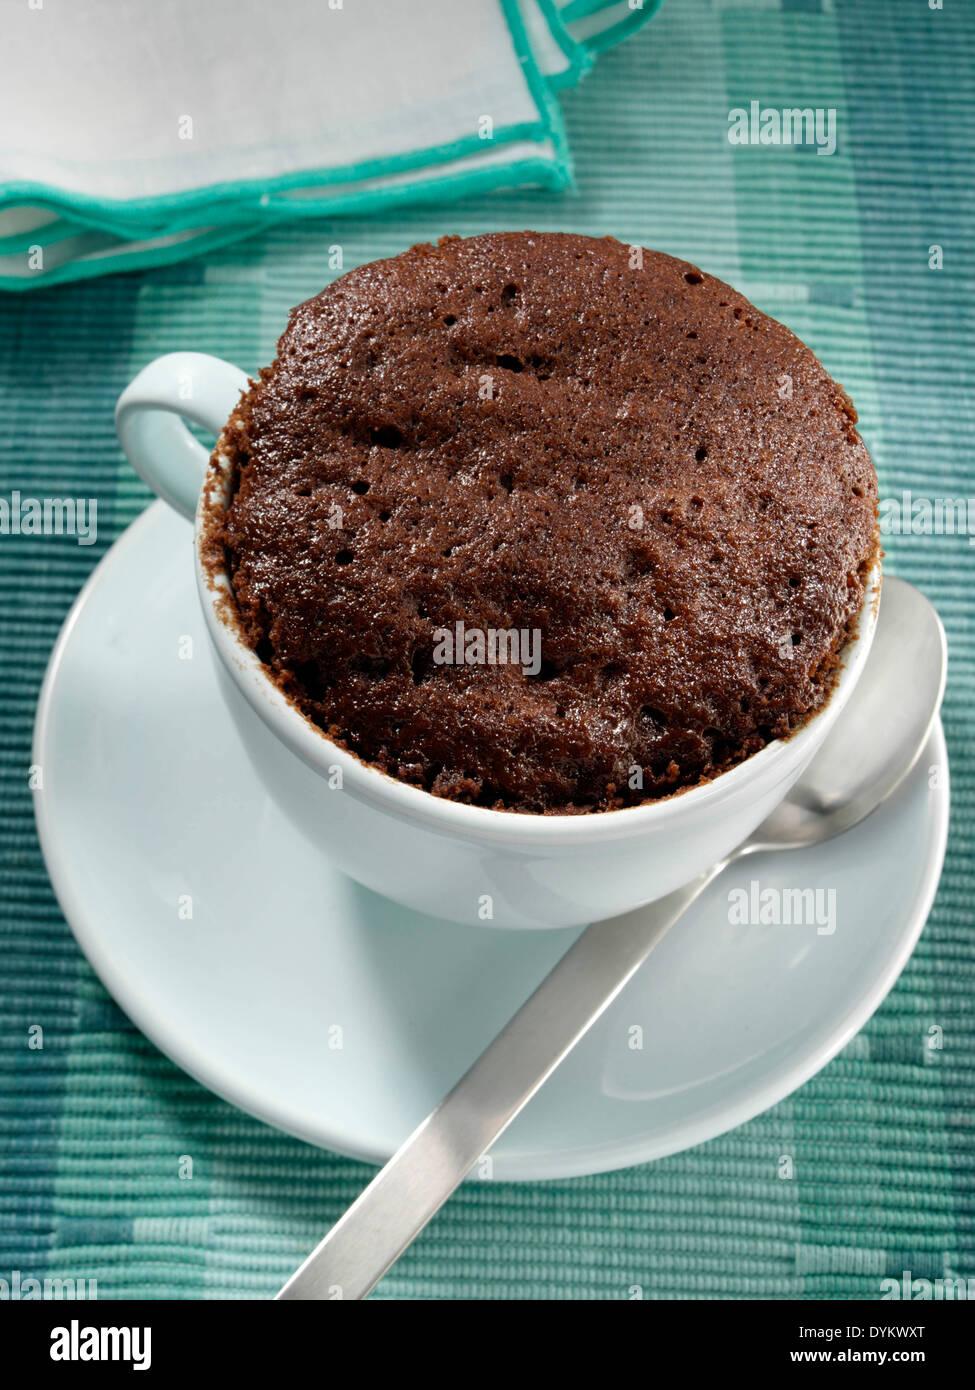 Squidgy chocolate cake microwaved in a mug dessert - Stock Image